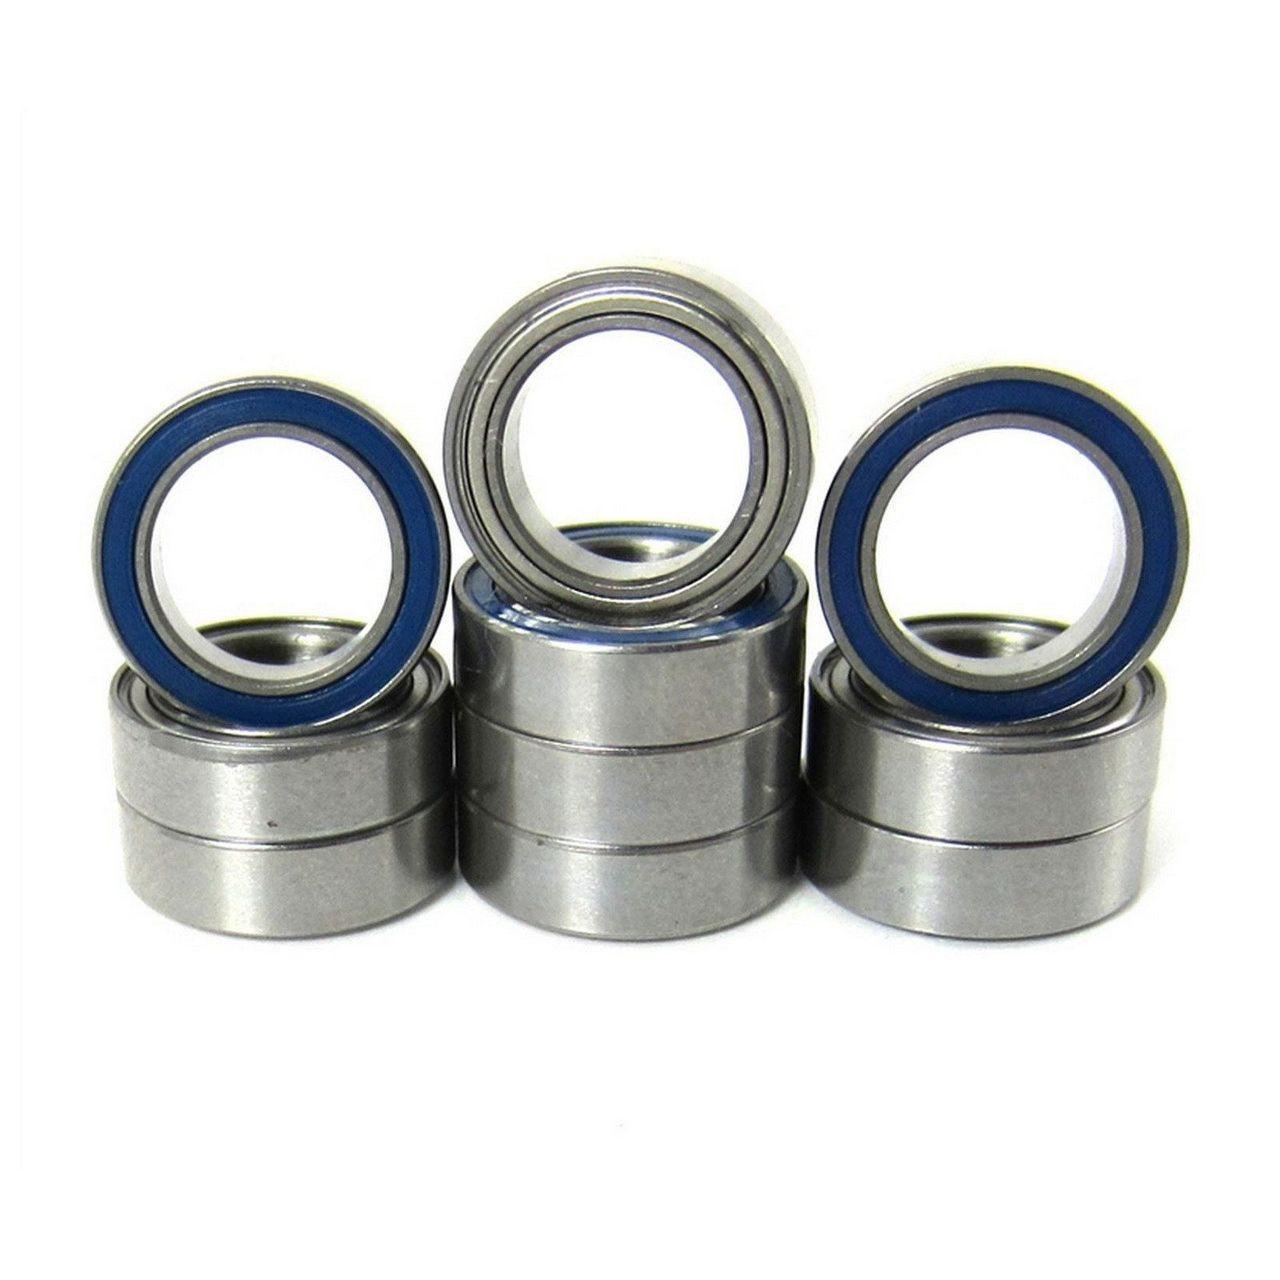 TRB RC 8x12x3.5mm Precision Ball Bearings ABEC 5 Hybrid Seals (10)